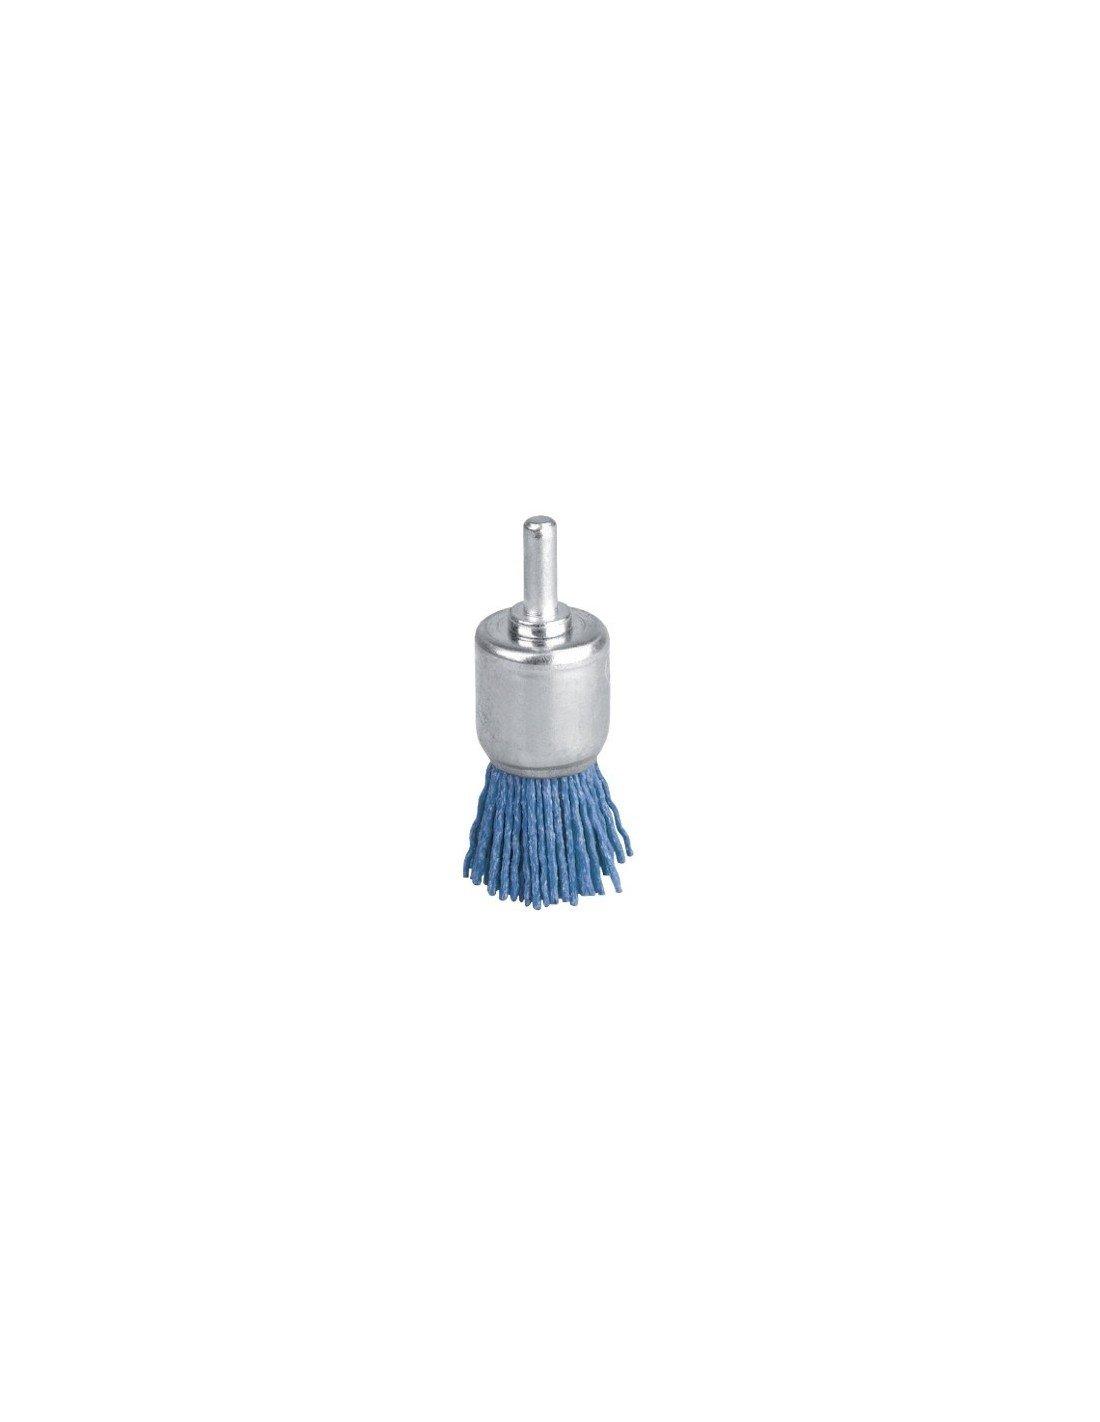 Brosse pinceau nylon bleu SCID - Diamè tre 20 mm